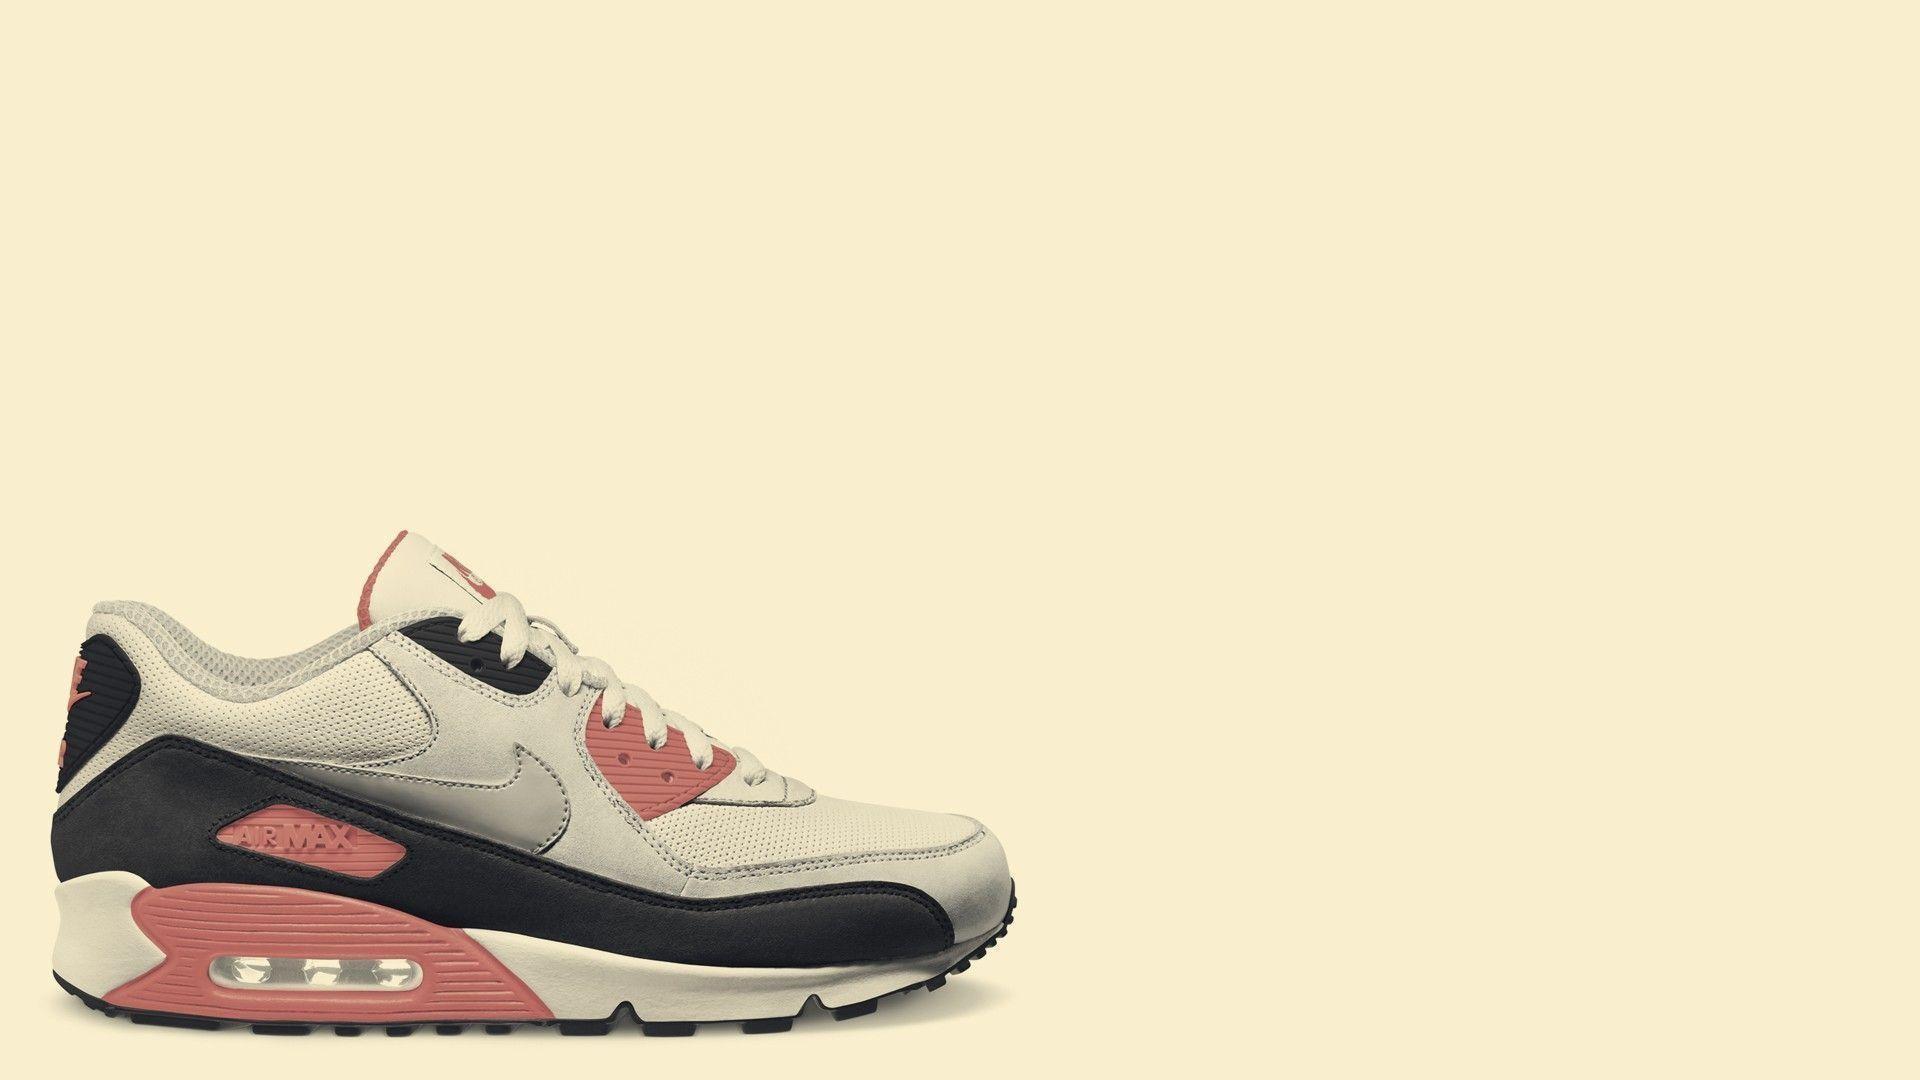 SneakerHDWallpapers.com – Free HD/HQ wallpapers of your ... |Foamposites Wallpaper Hd